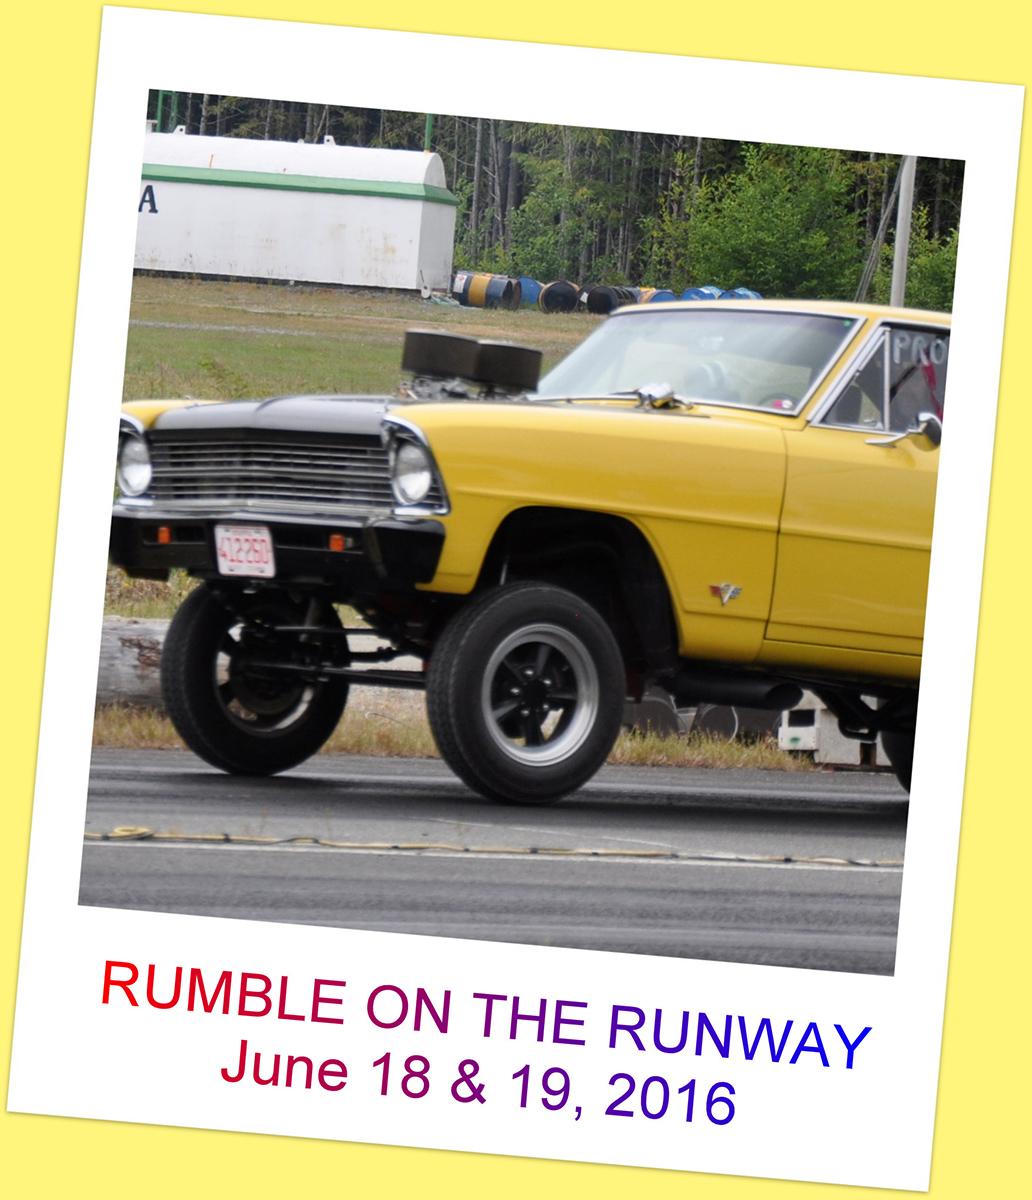 Rumble on the Runway June 18 & 19, 2016 1228